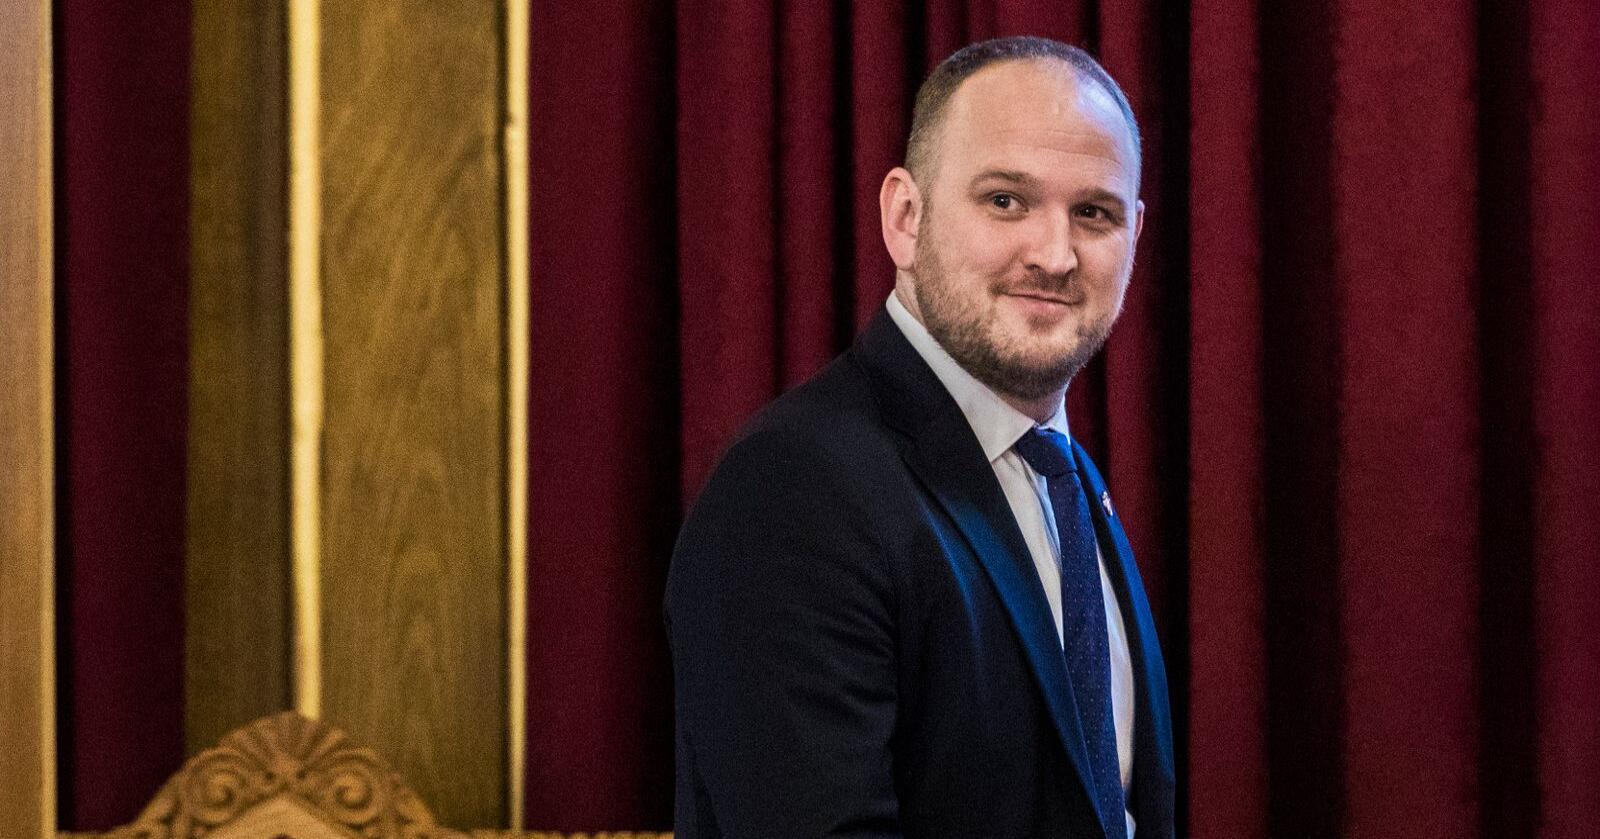 Fremskrittspartiets energi- og miljøpolitiske talsperson Jon Georg Dale fremmer nå egne forslag i ulvepolitikken. Foto: Ole Berg-Rusten / NTB scanpix